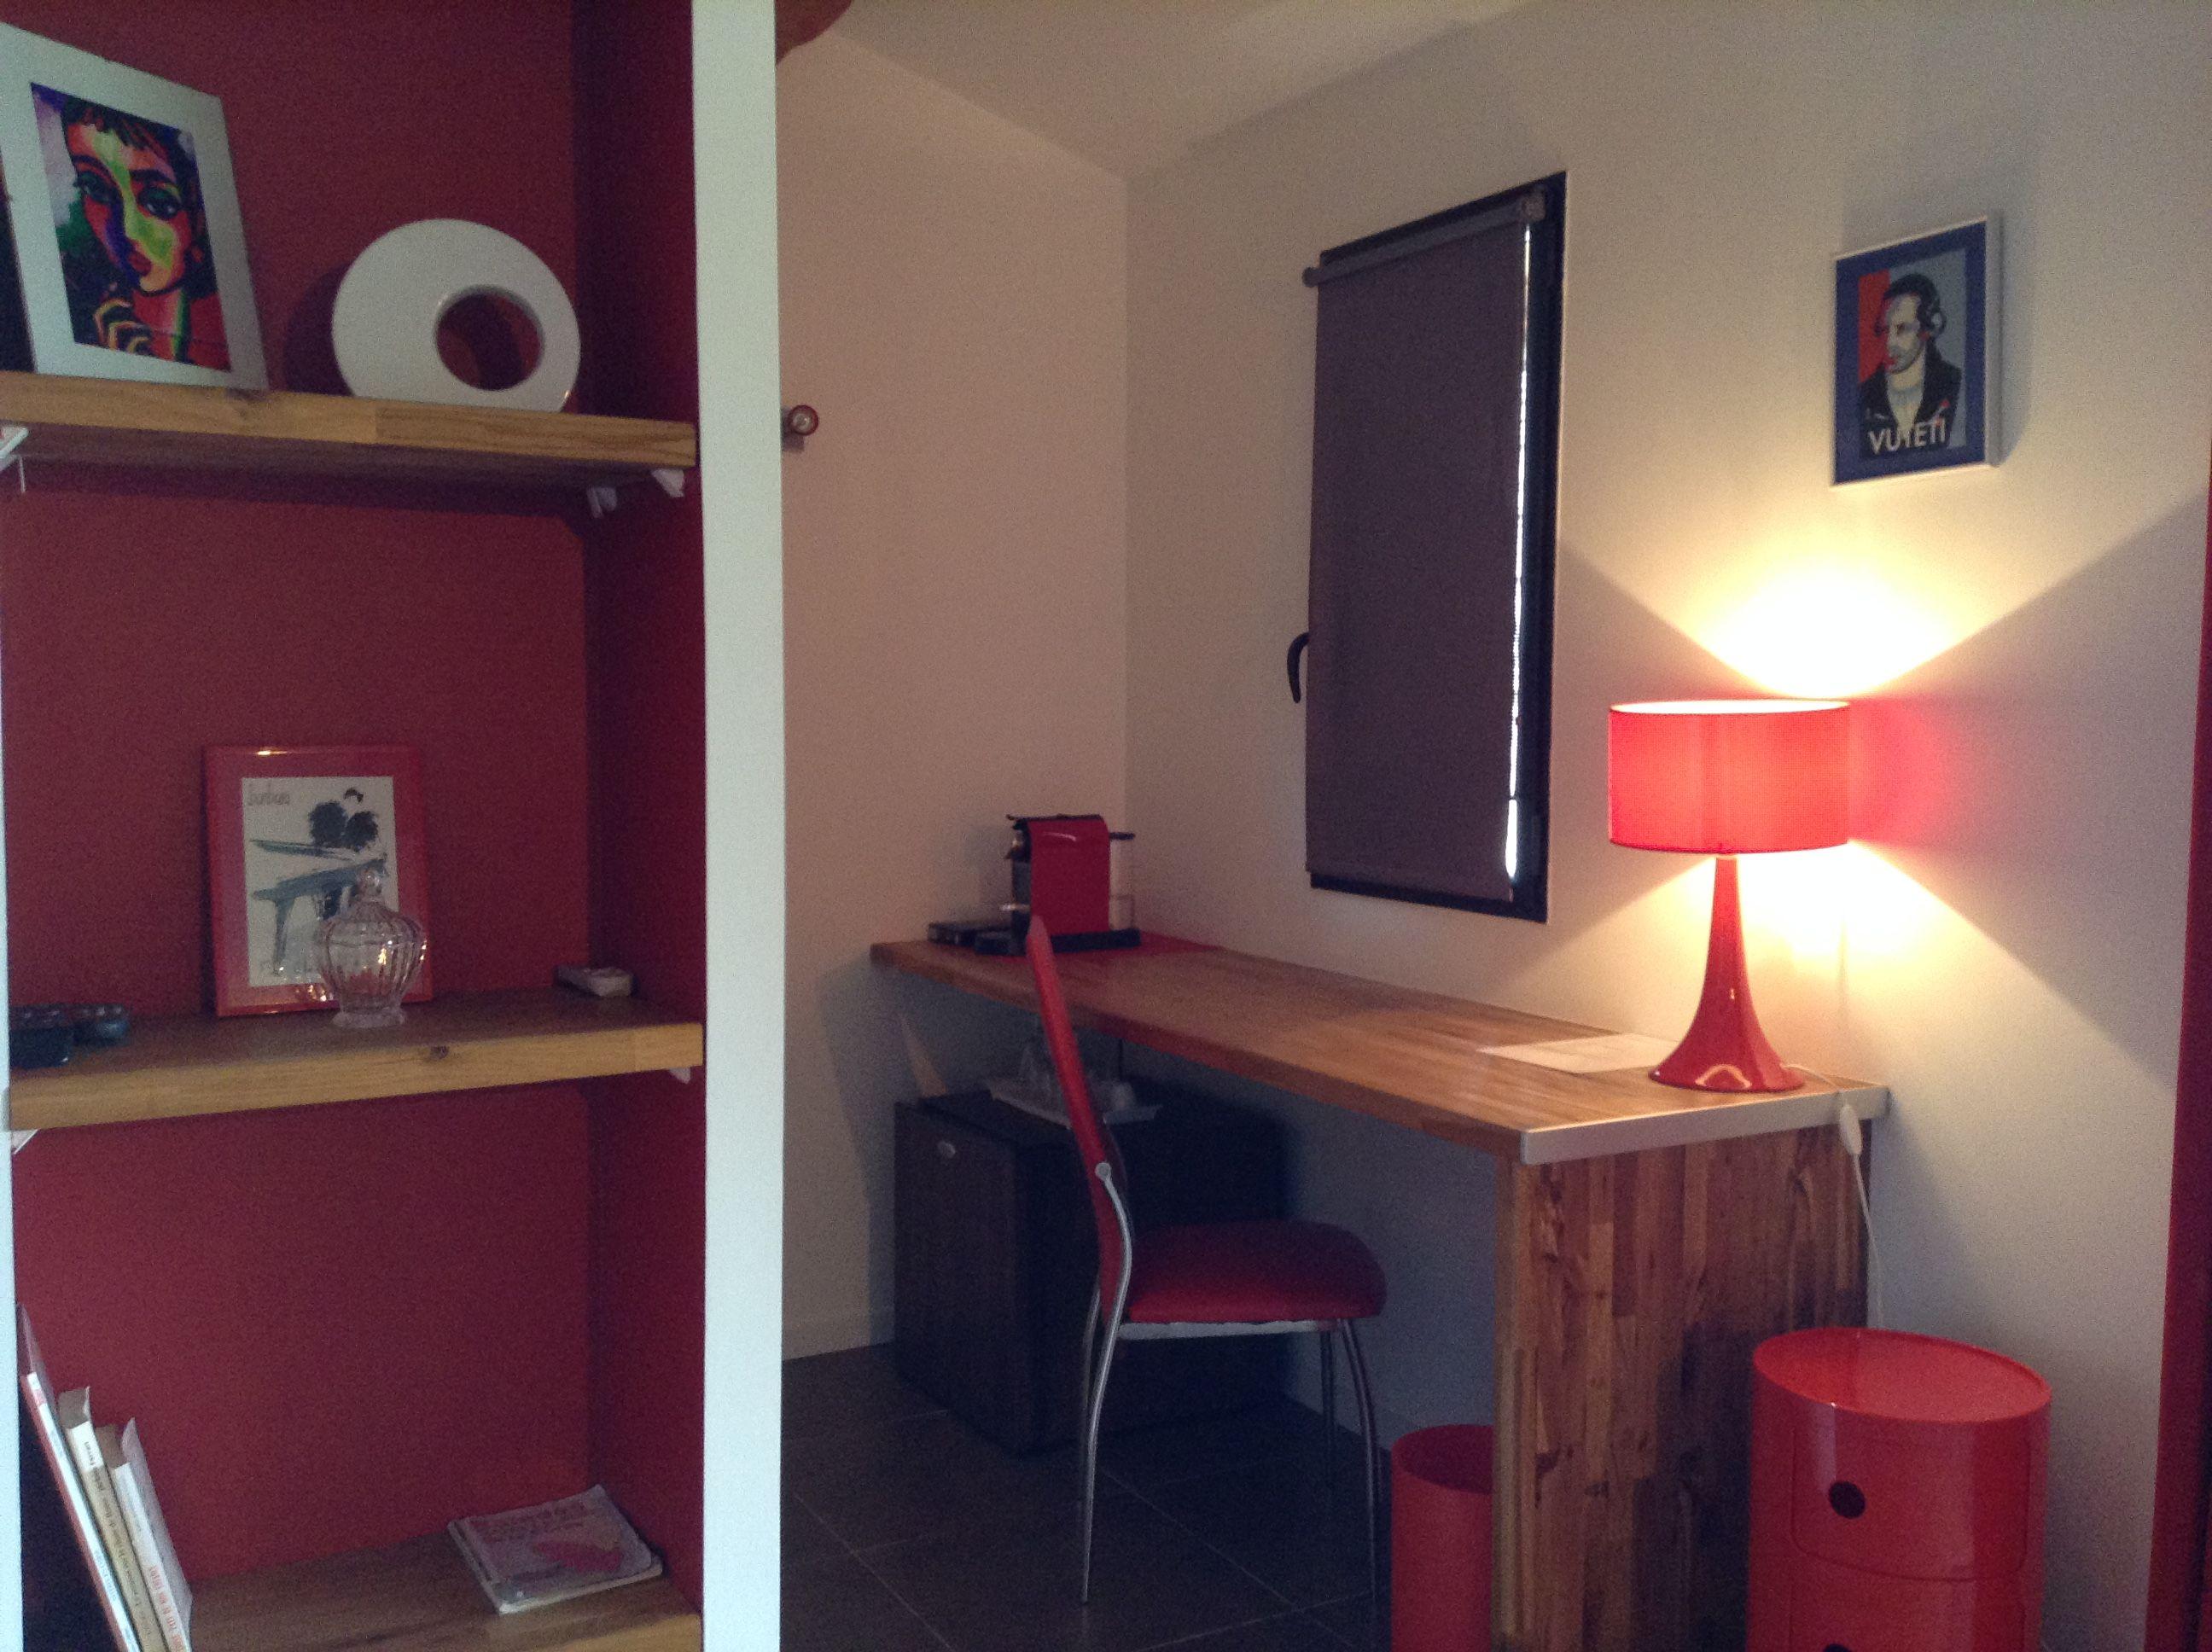 les-jardins-de-mathieu-chambres-d-hotes-luxe-muratello-porto-vecchio-chambre